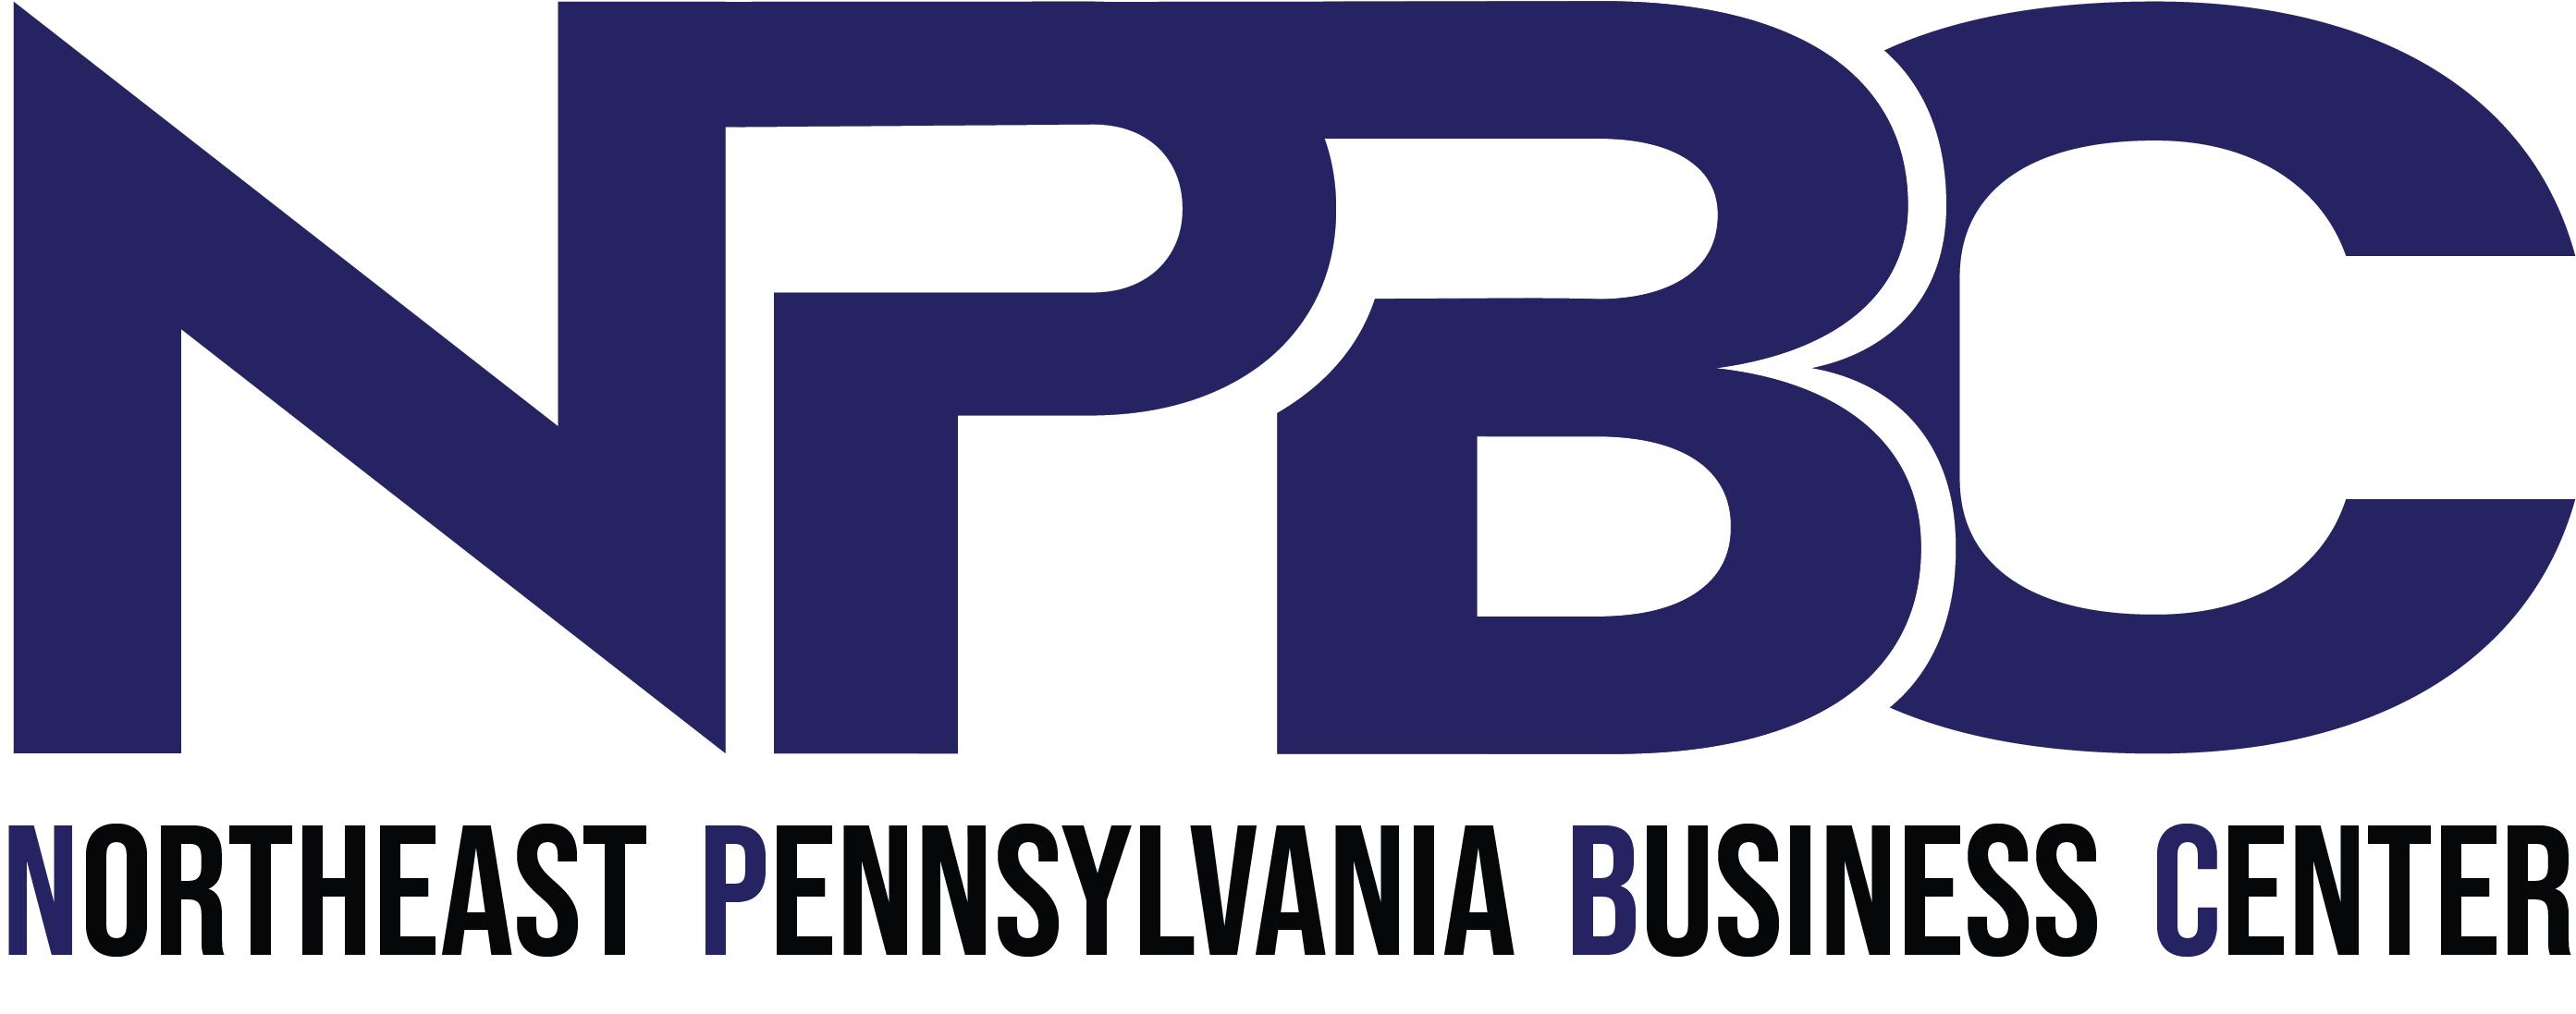 NPBC Job Fair Organizers